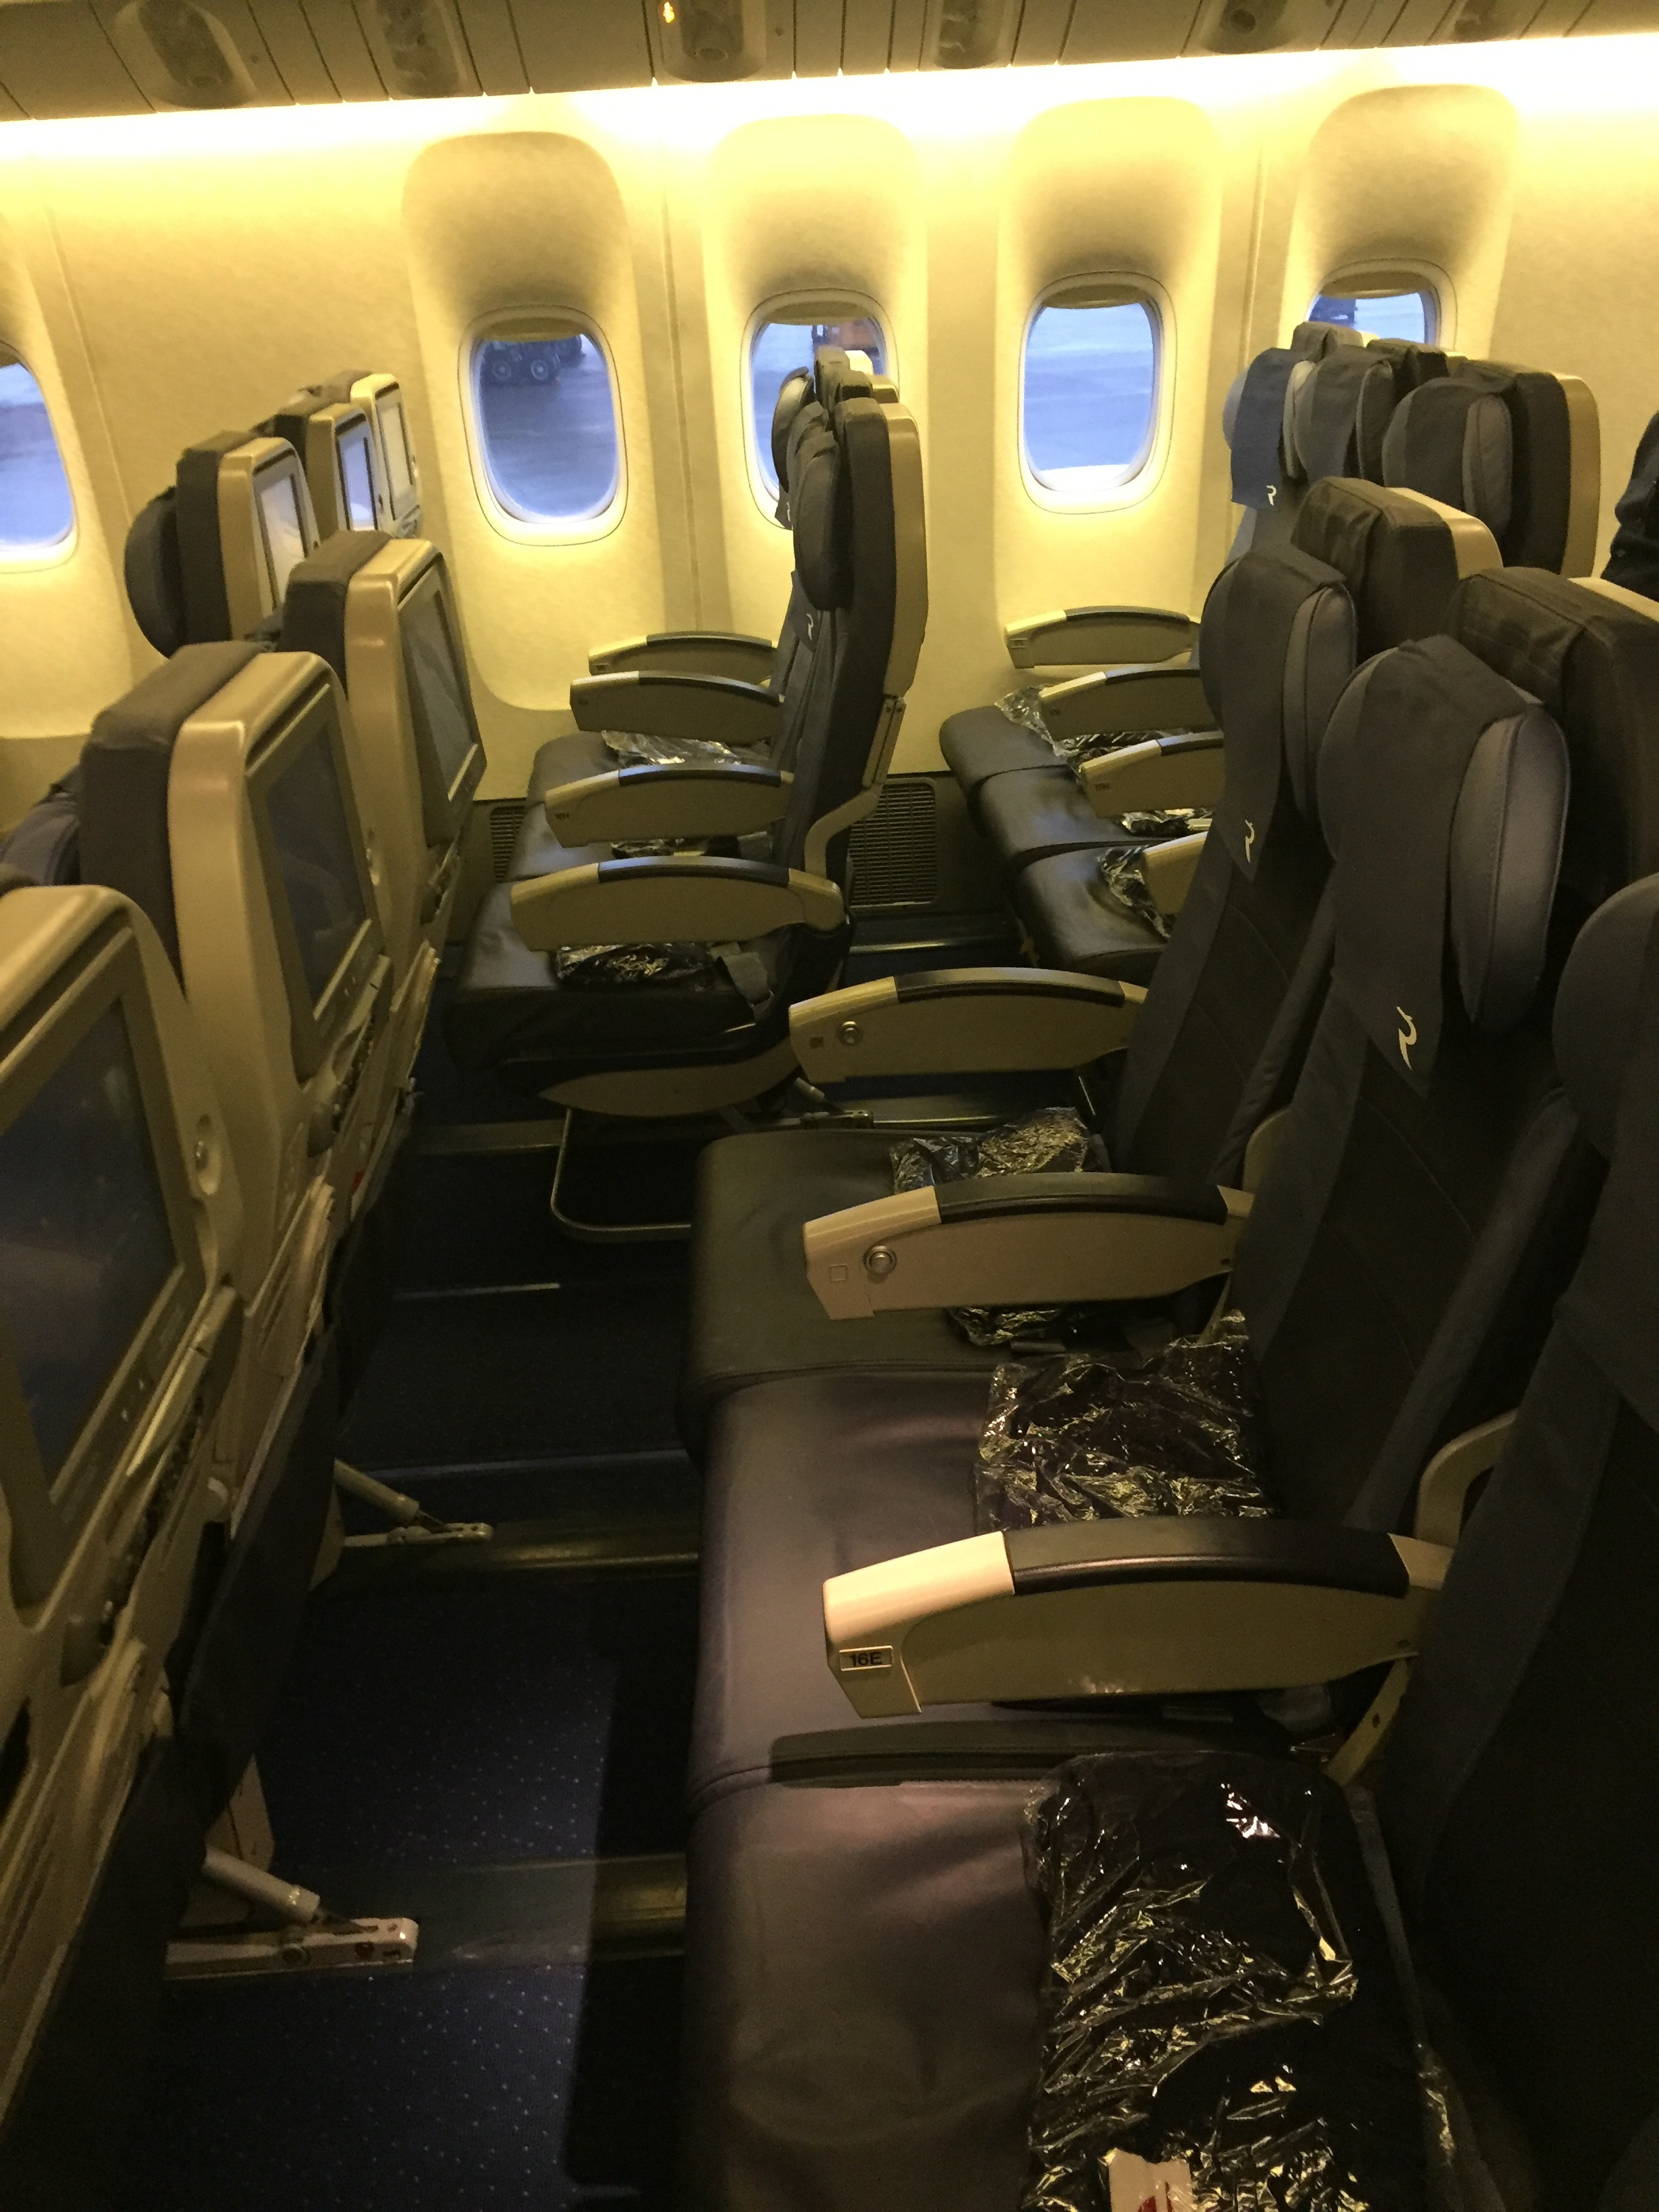 rossiya airlines seats.JPG